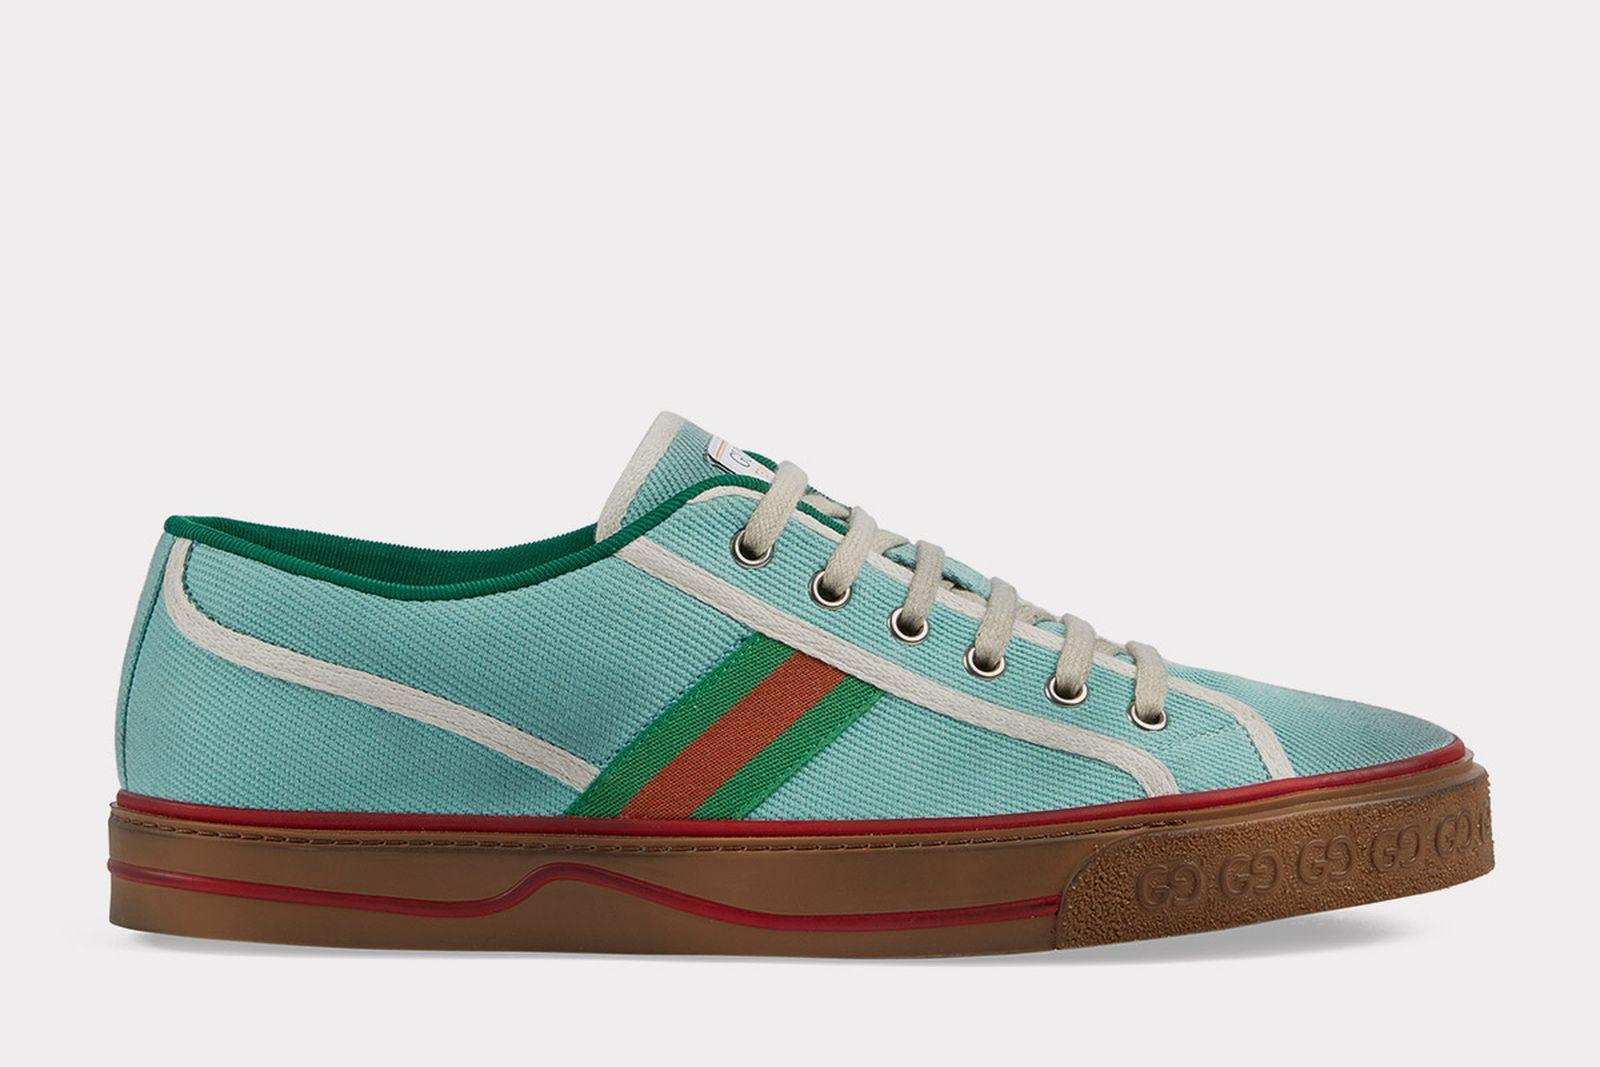 gucci-tennis-1977-release-date-price-08